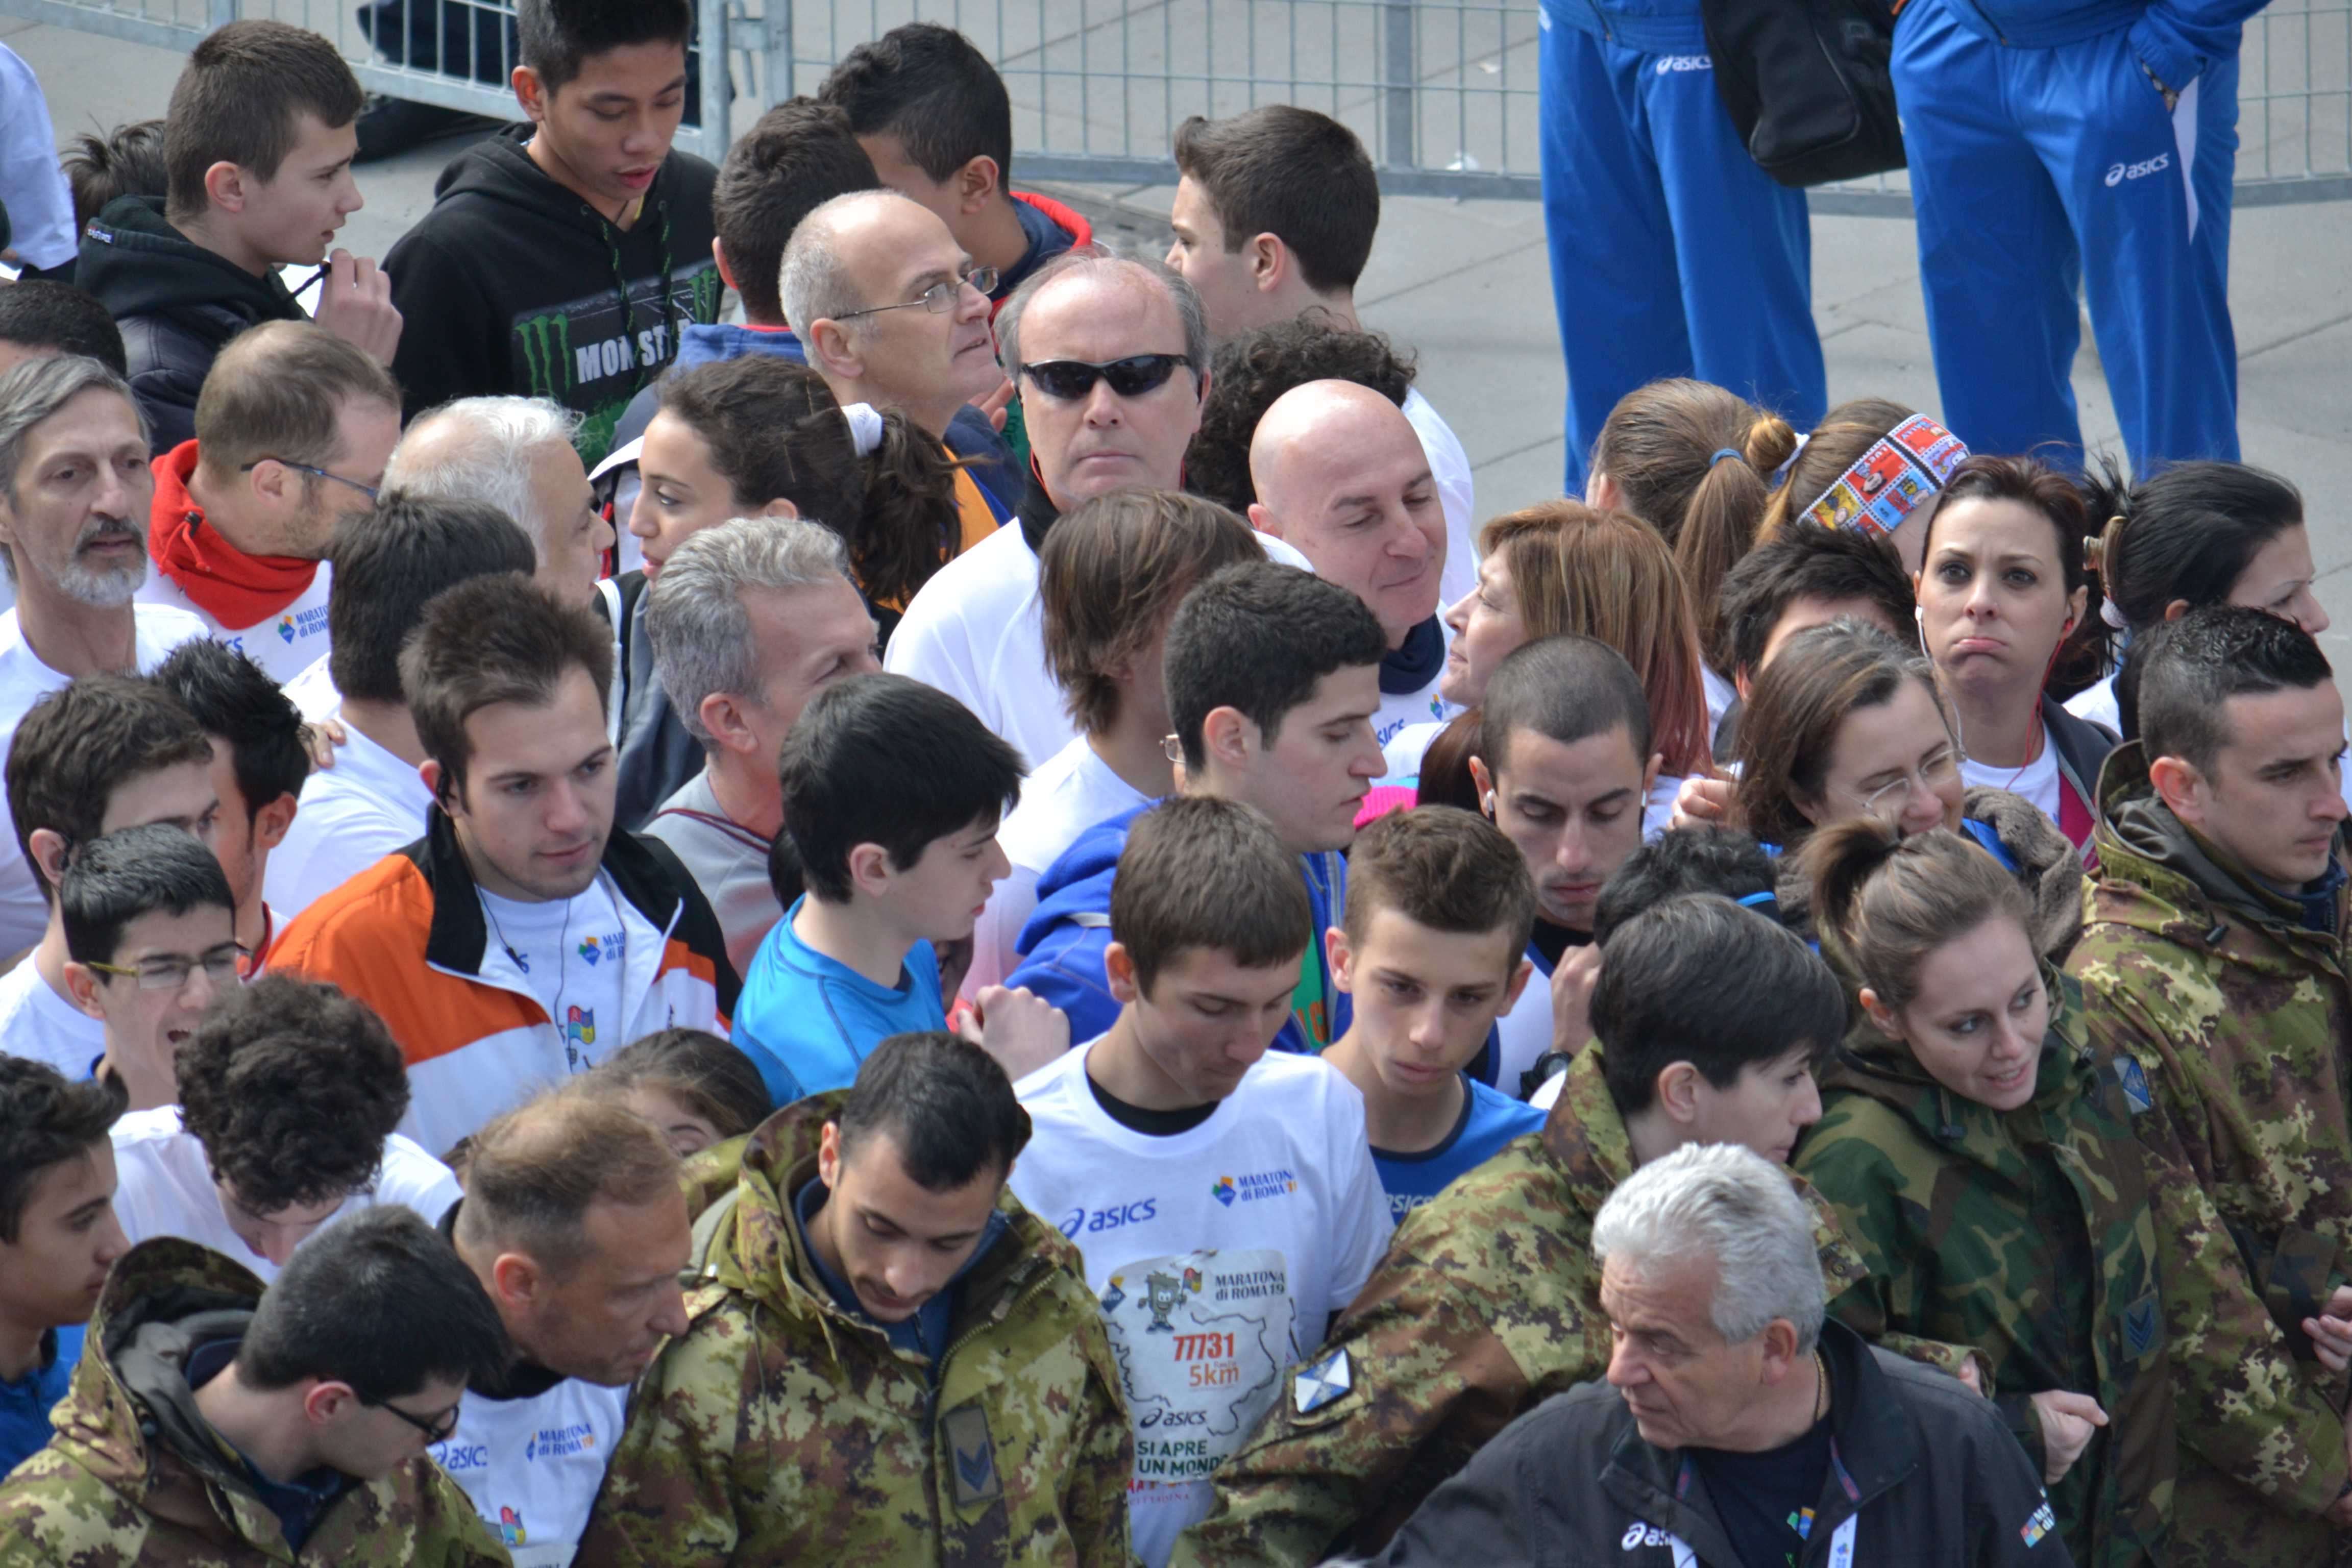 maratona-di-roma-2013-379